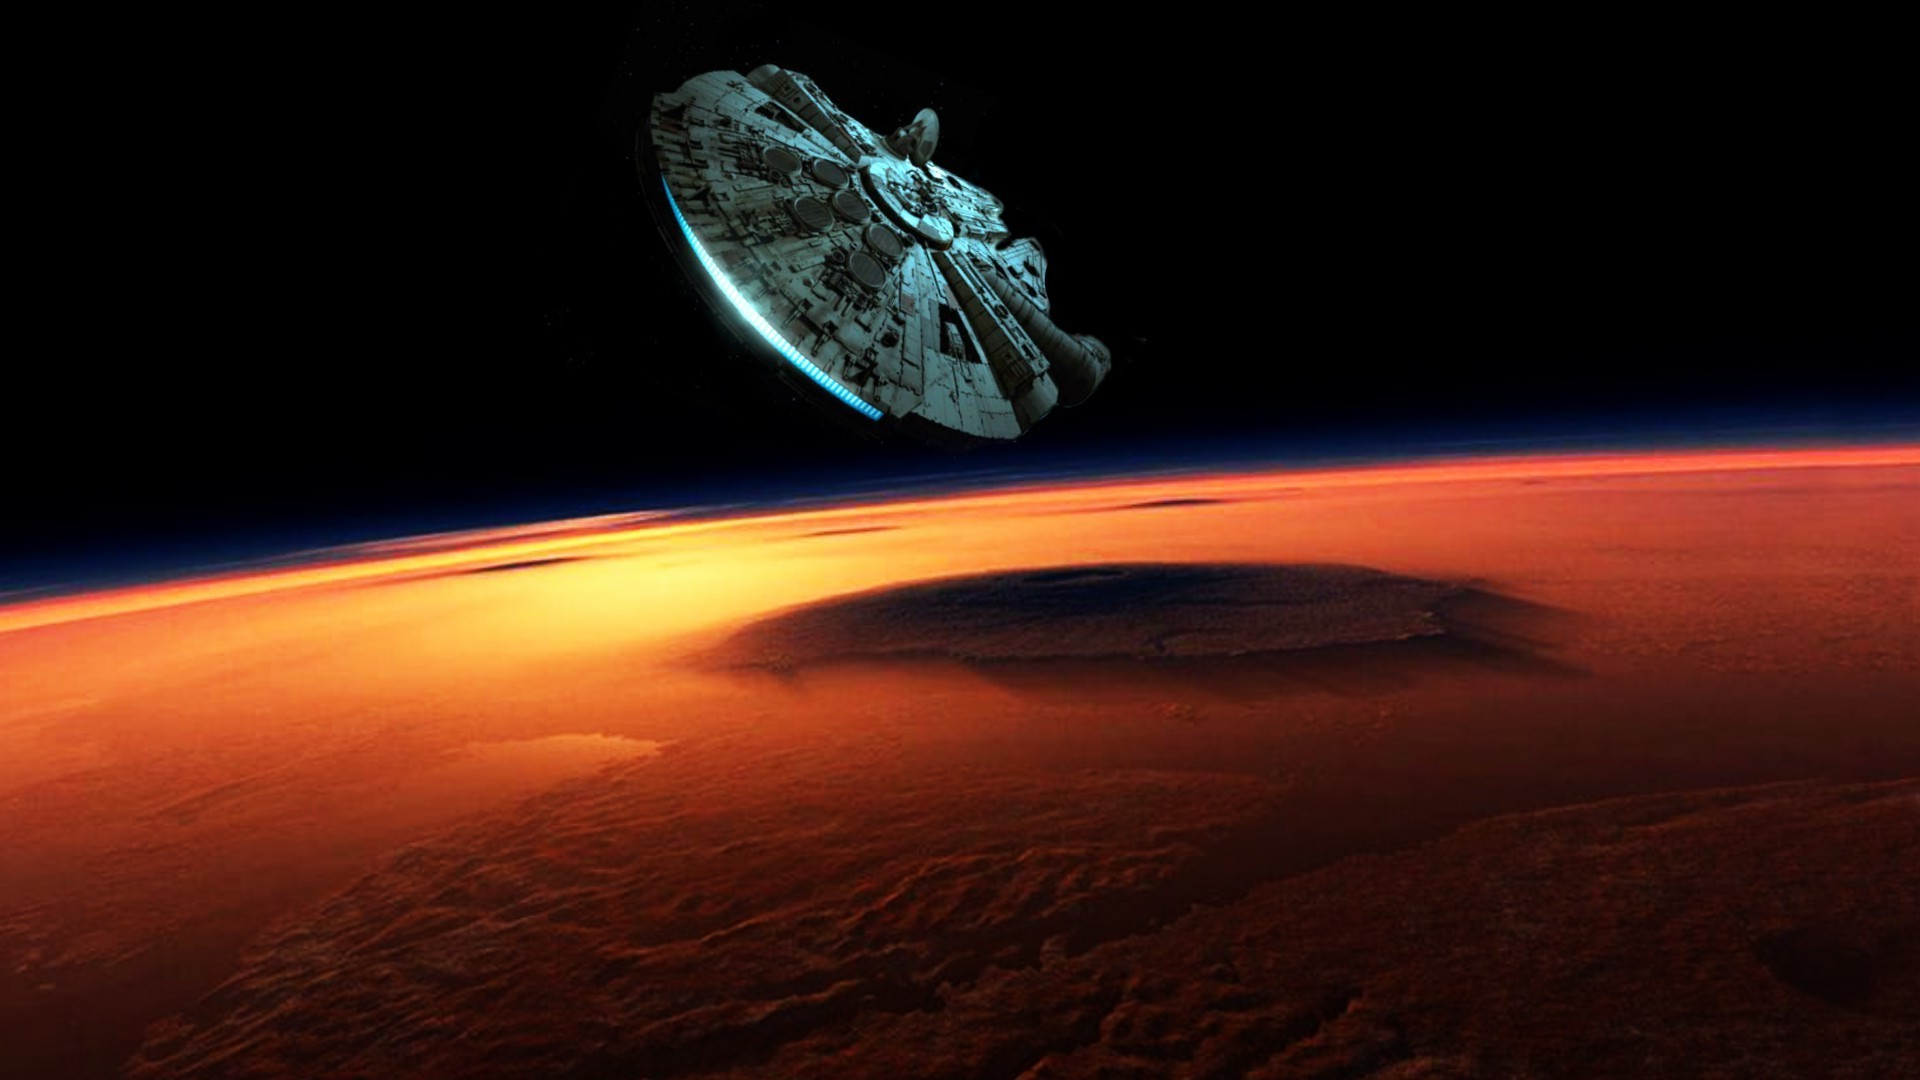 192 Star Wars Space Background